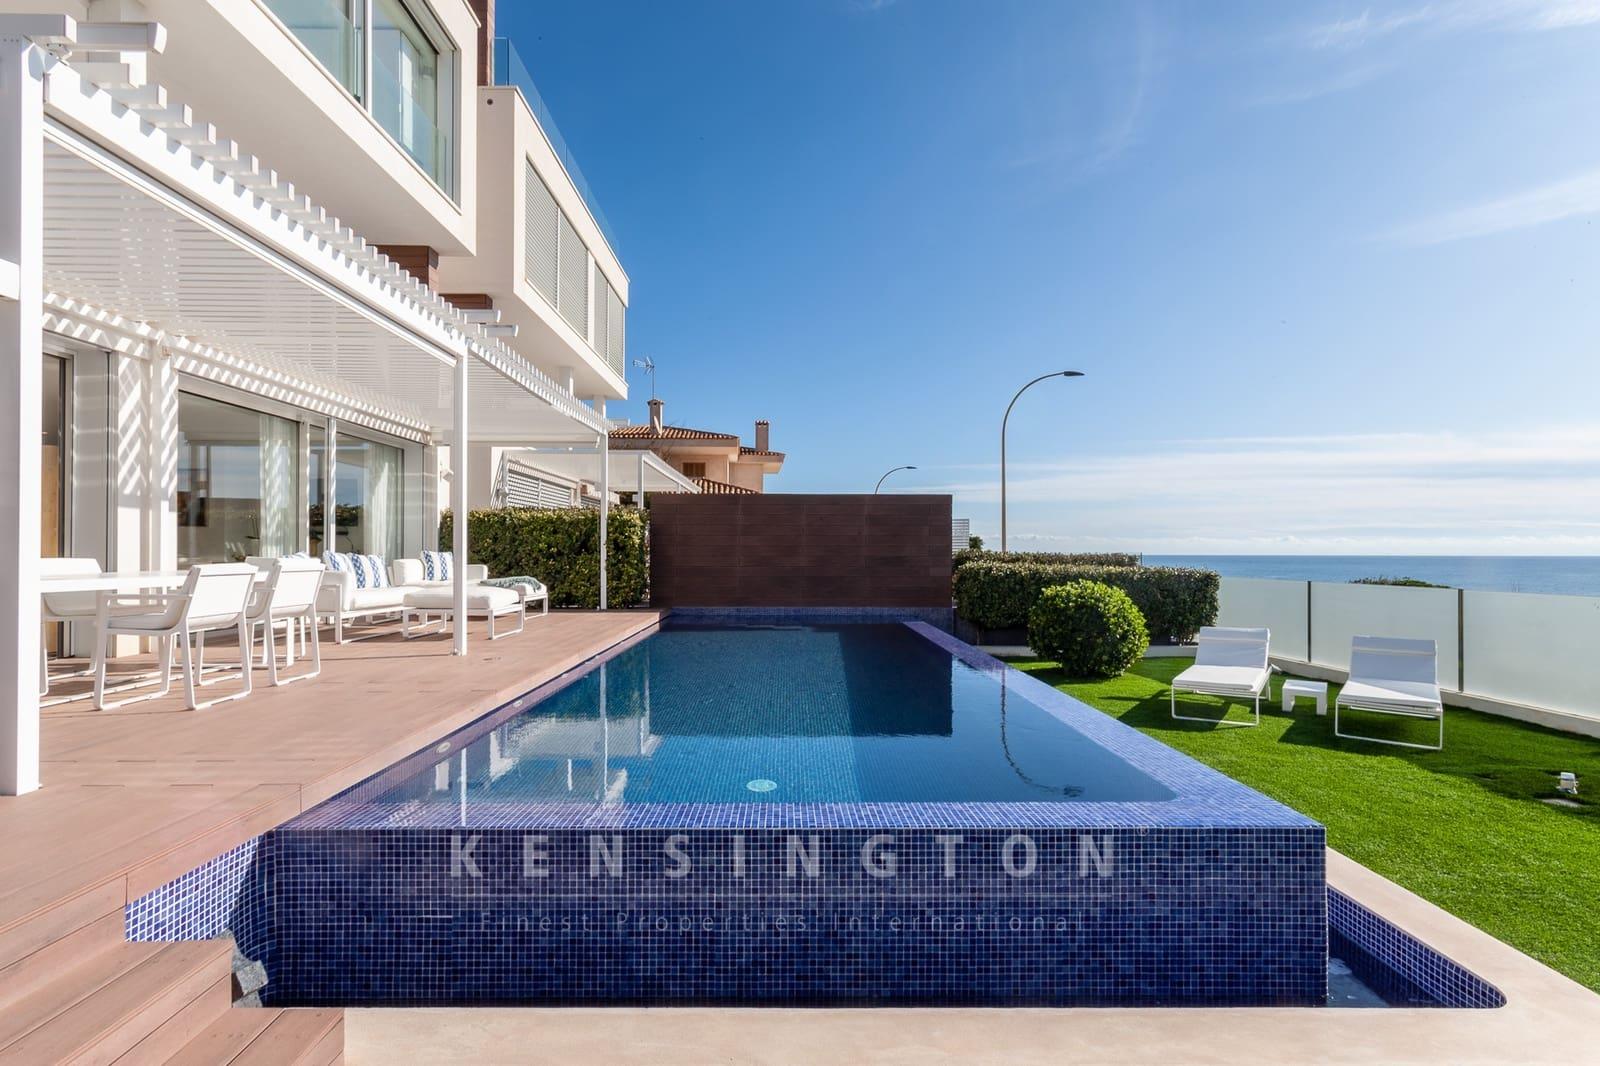 2 bedroom Apartment for sale in Portocristo / Port de Manacor with pool - € 998,000 (Ref: 4851457)